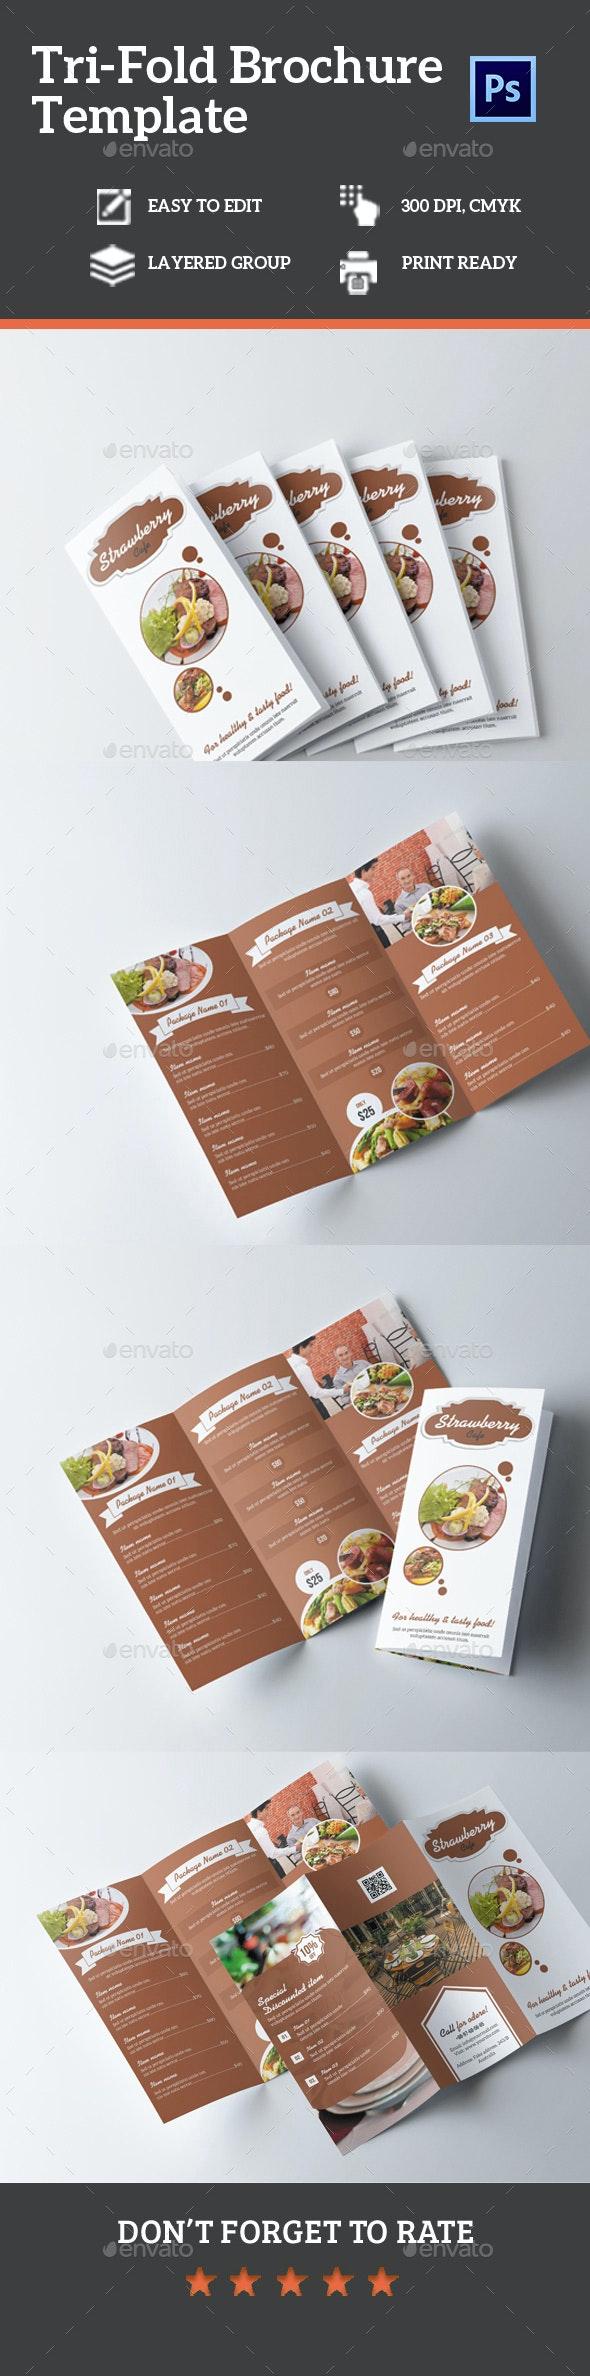 Food Menu Tri-Fold Brochure Vol. 1 - Food Menus Print Templates